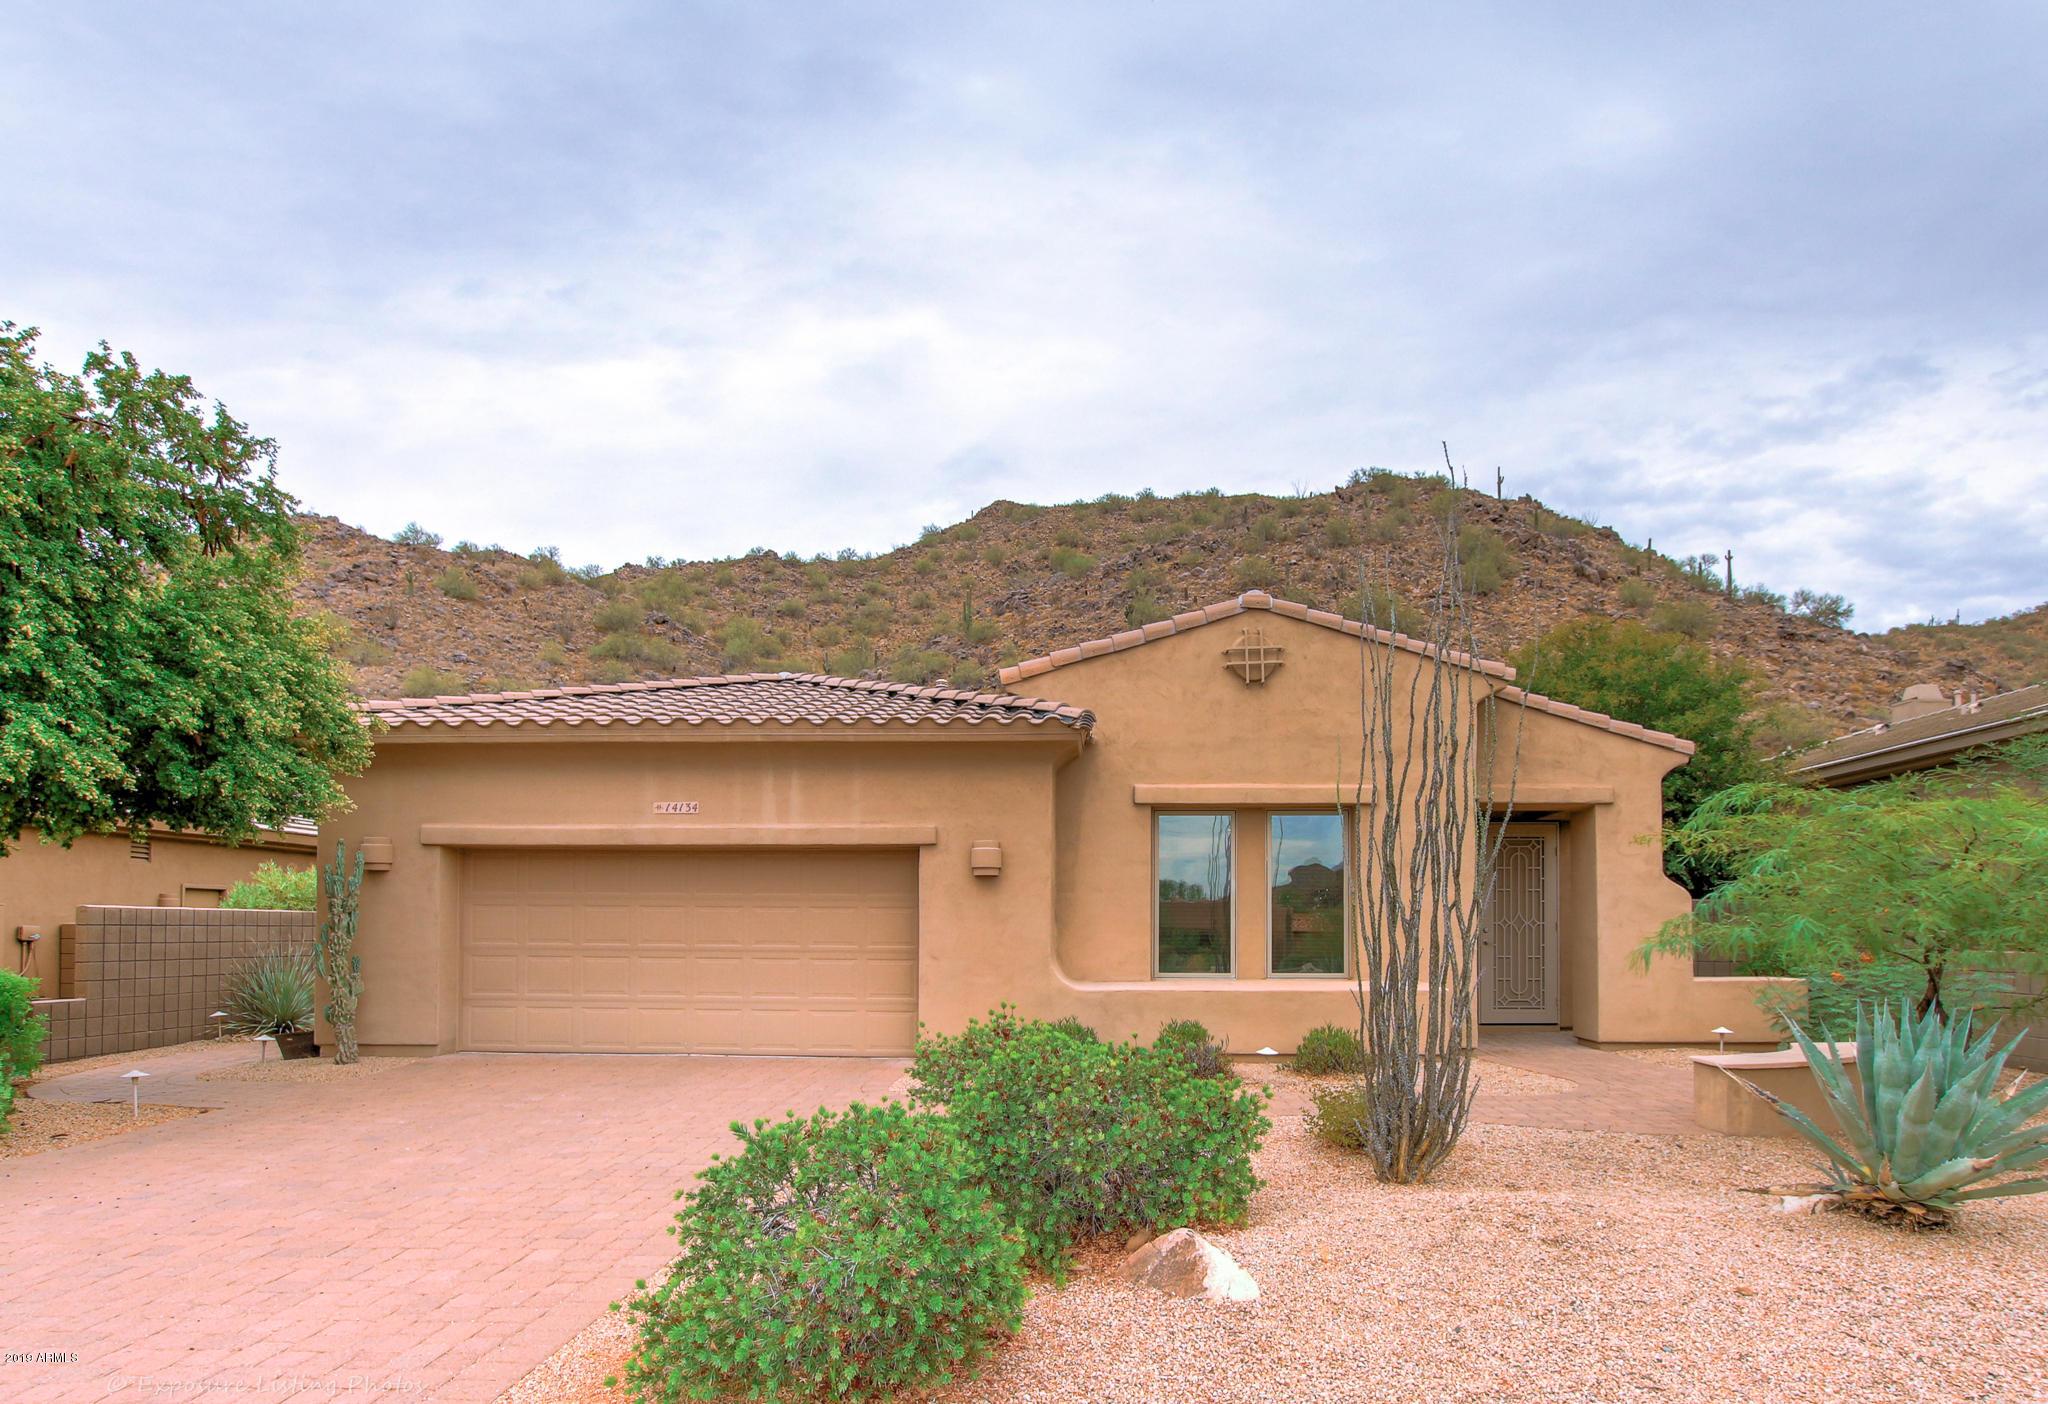 Photo of 14134 E COYOTE Road, Scottsdale, AZ 85259